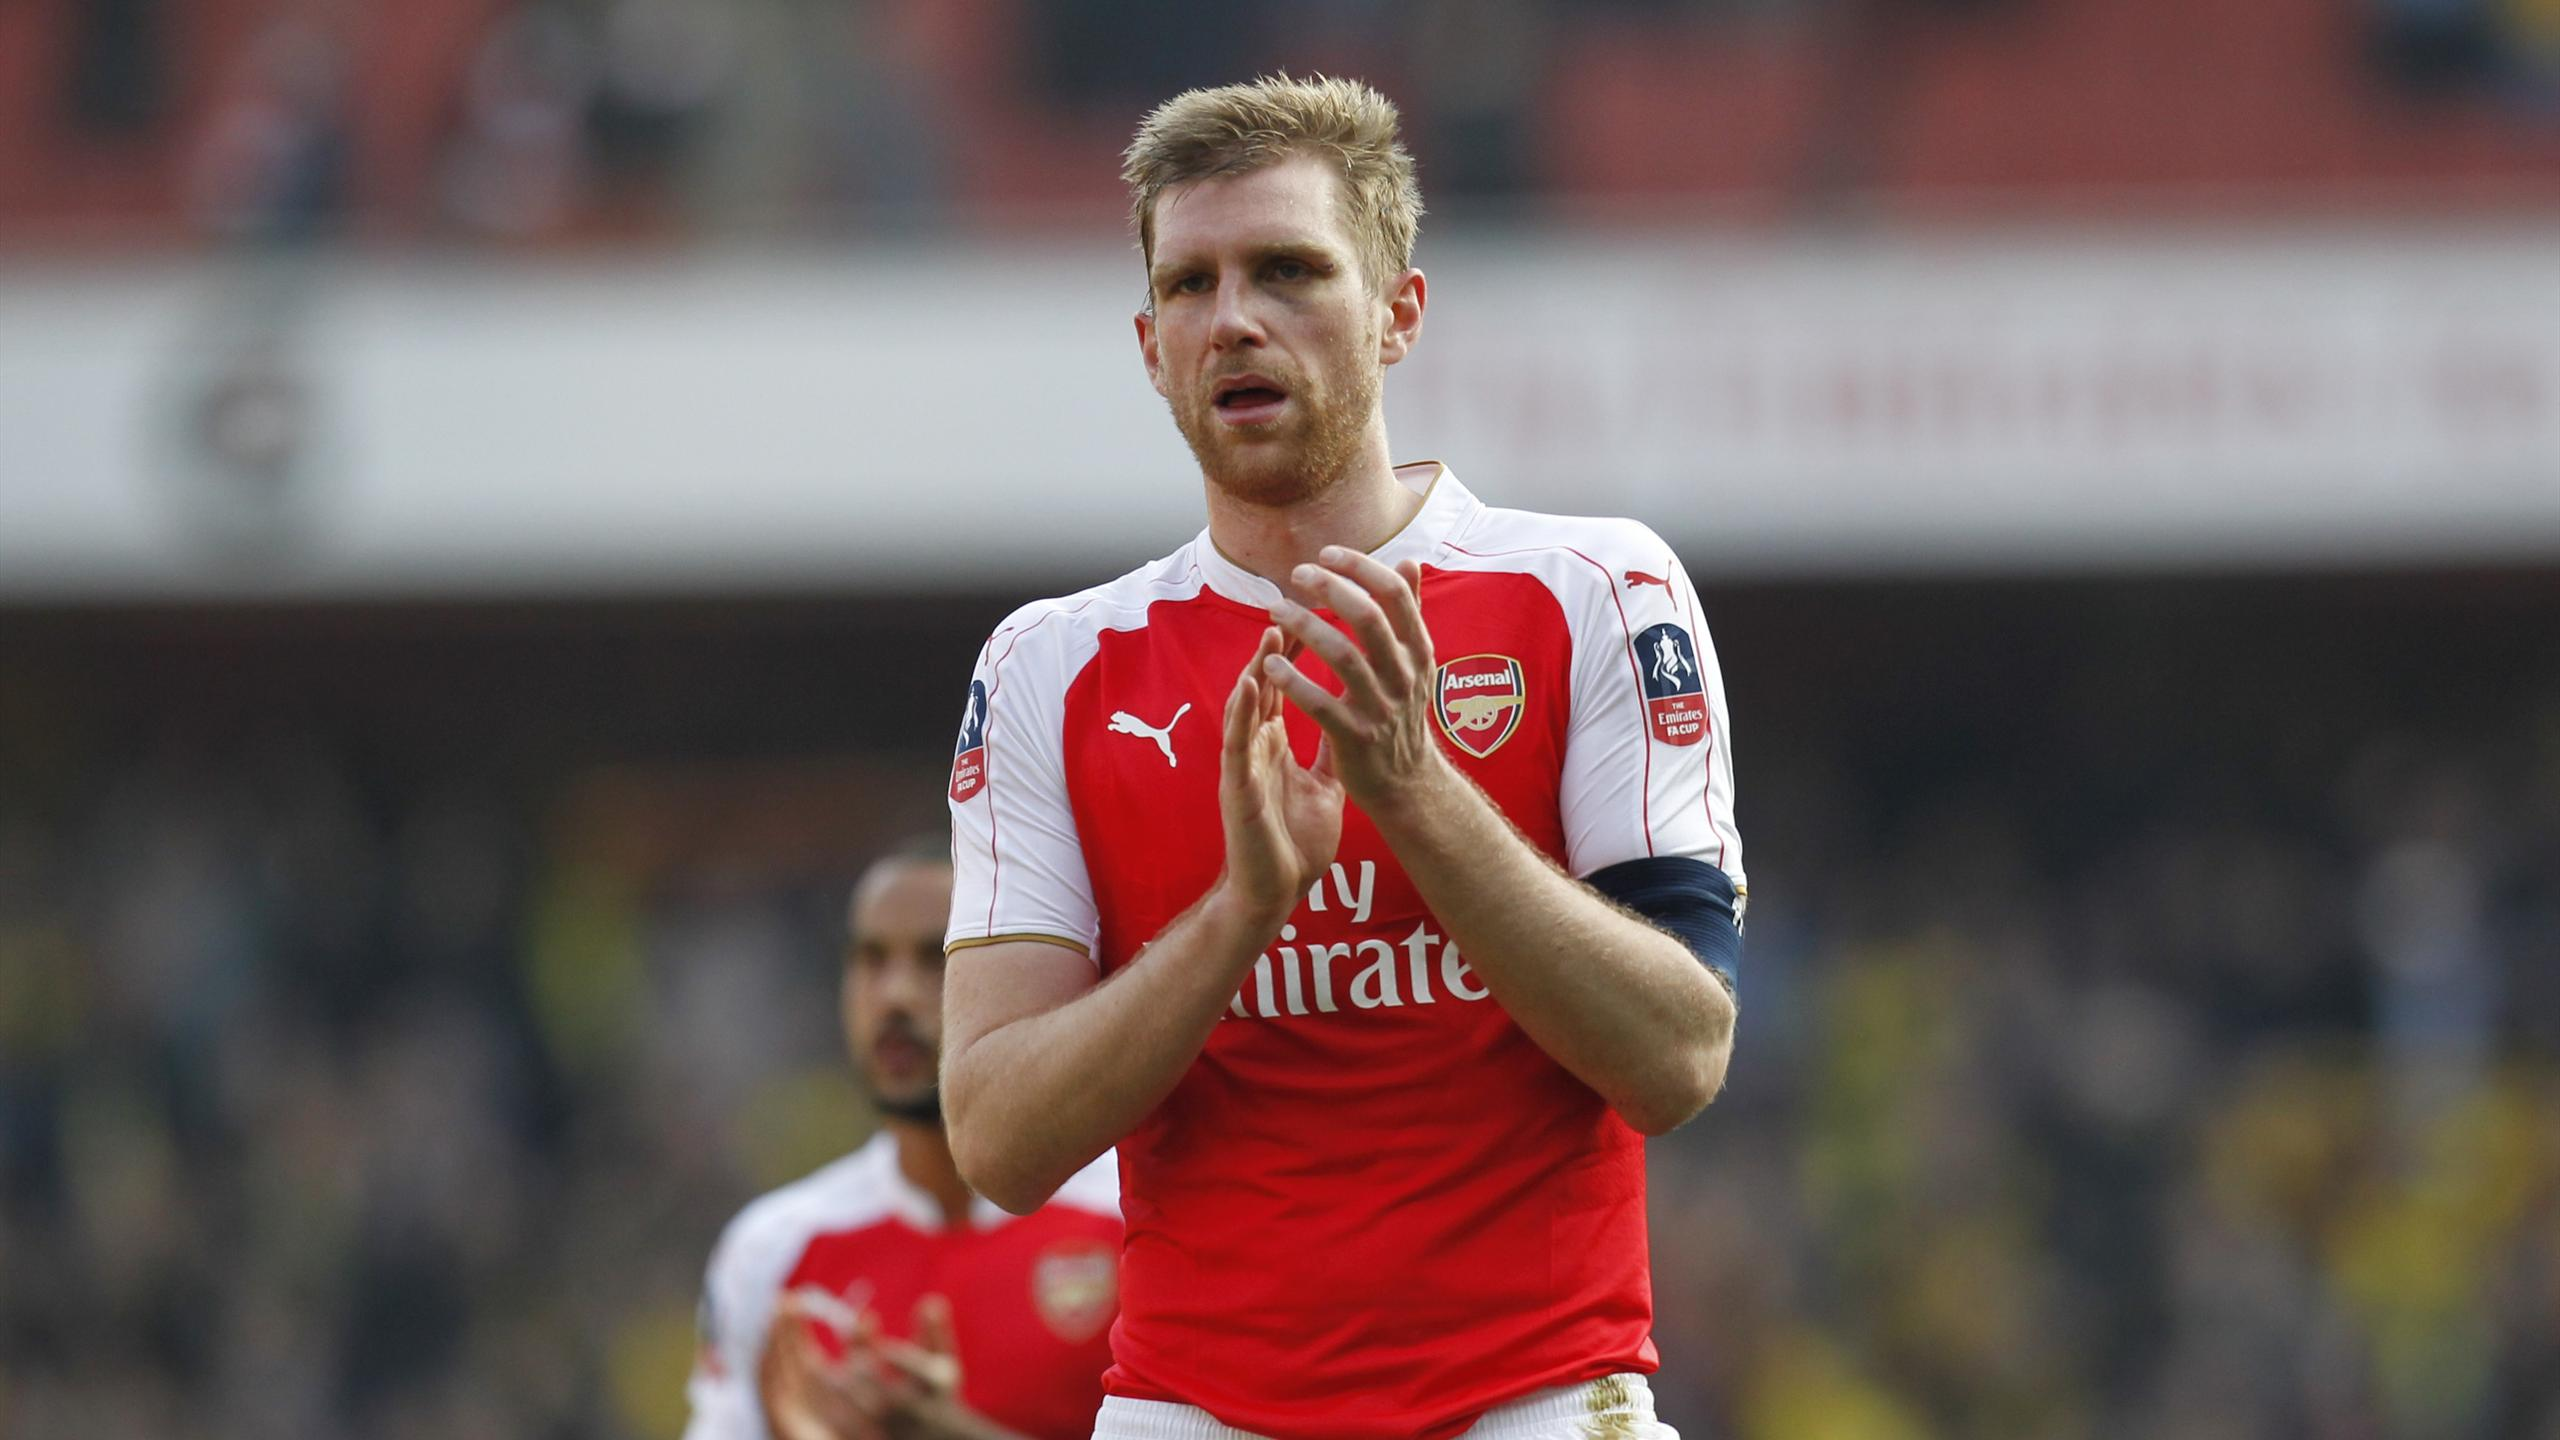 Arsenal's German defender Per Mertesacker appauds supporters